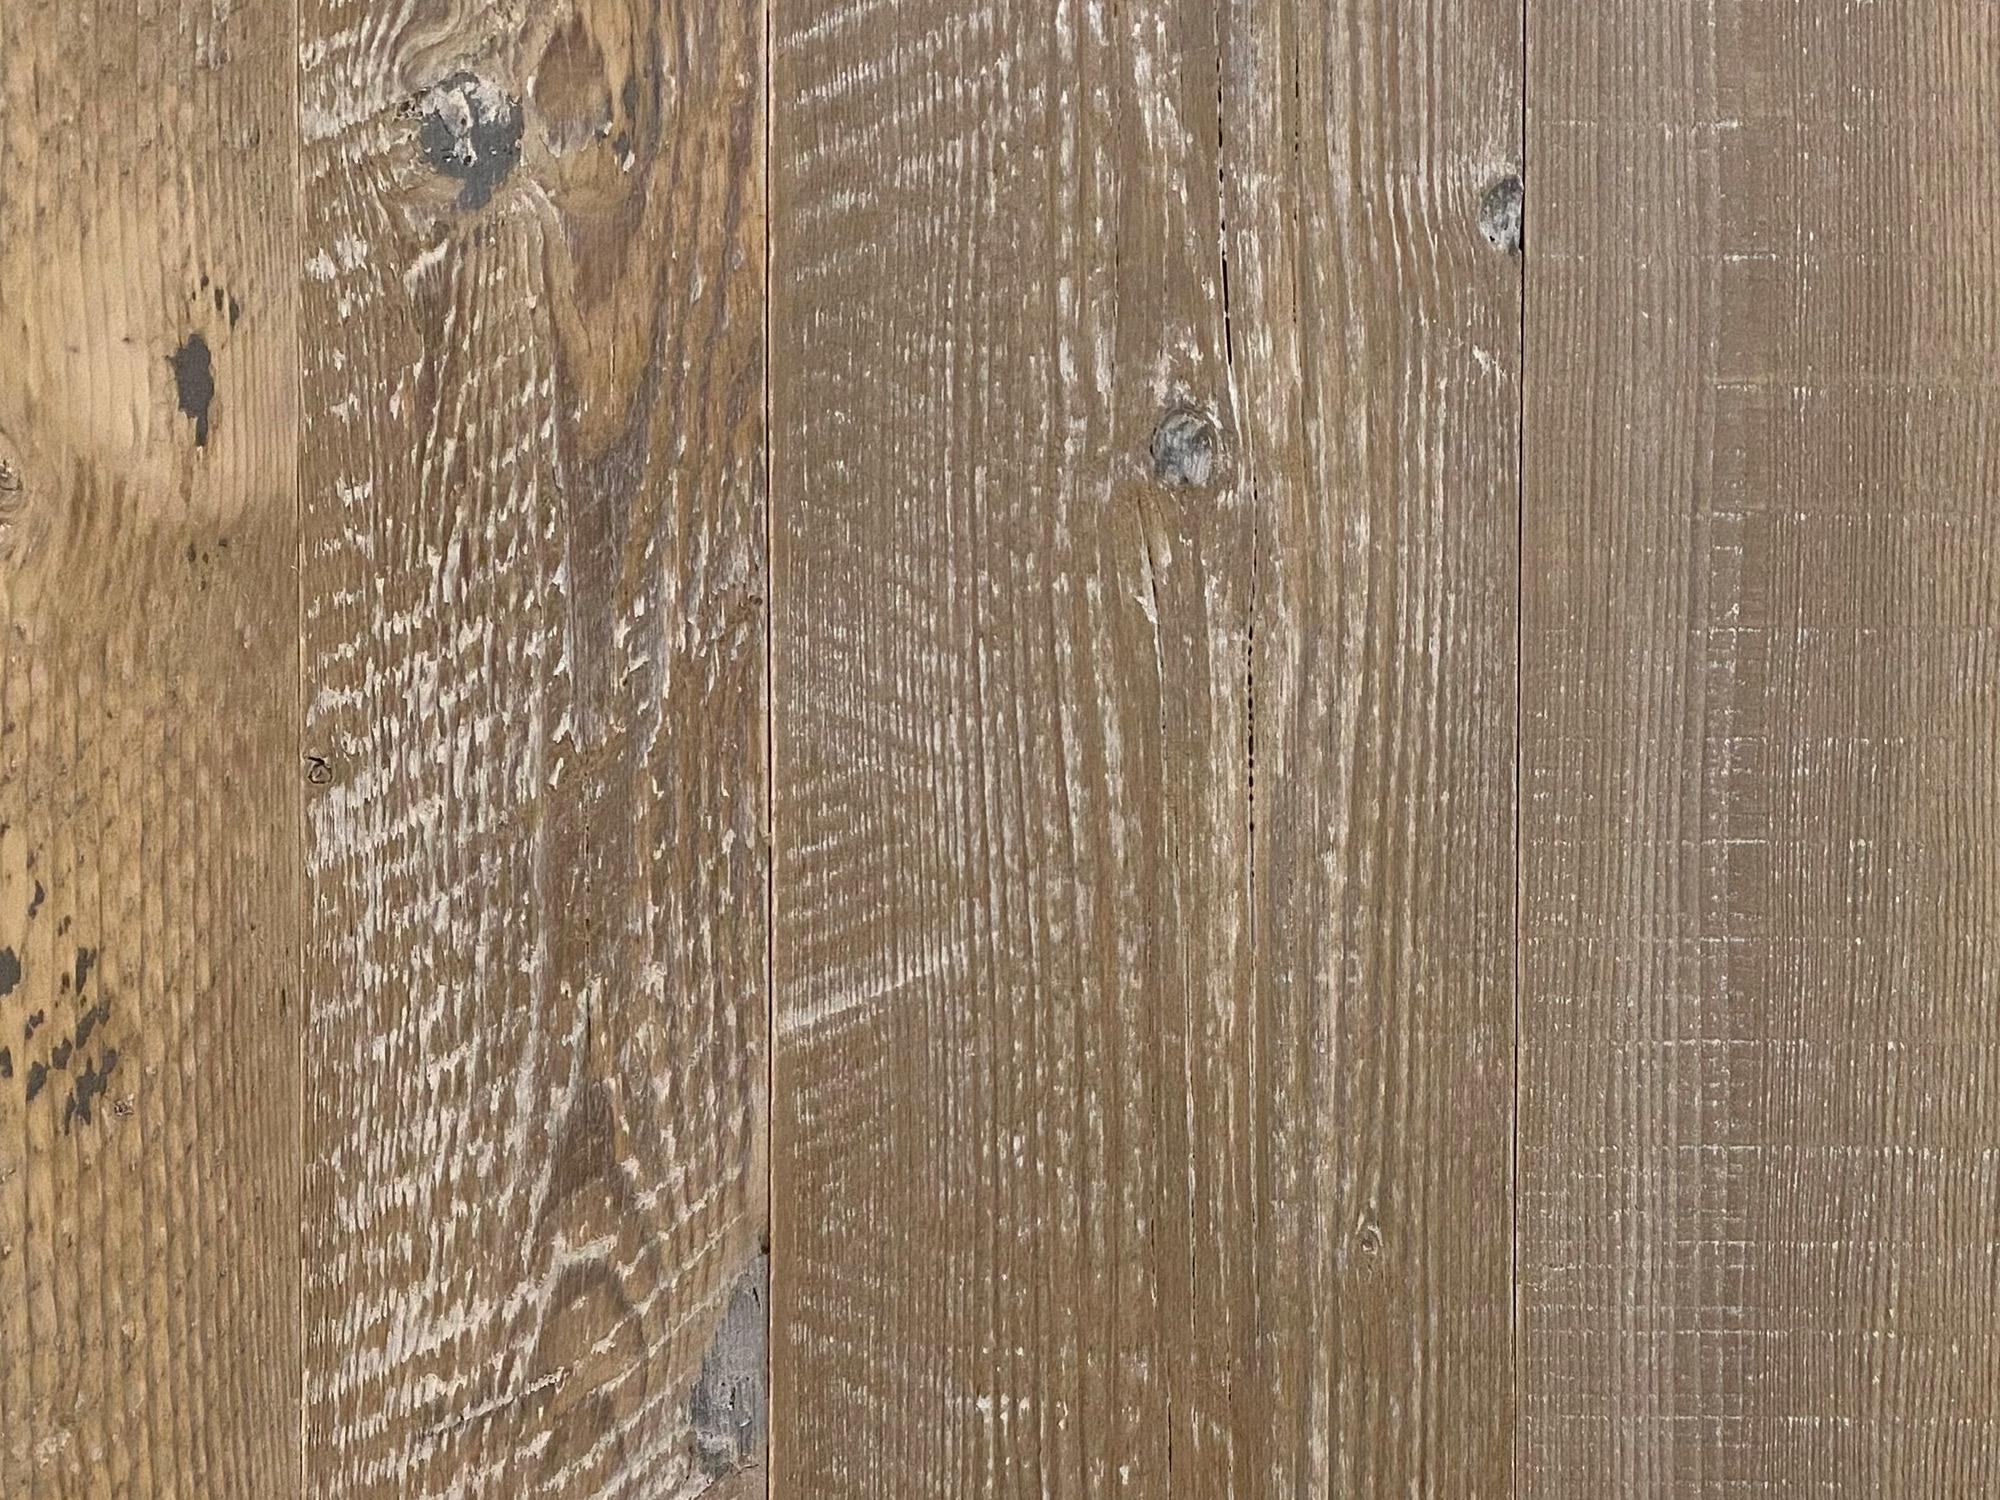 Rustic reclaimed pine spruce flooring